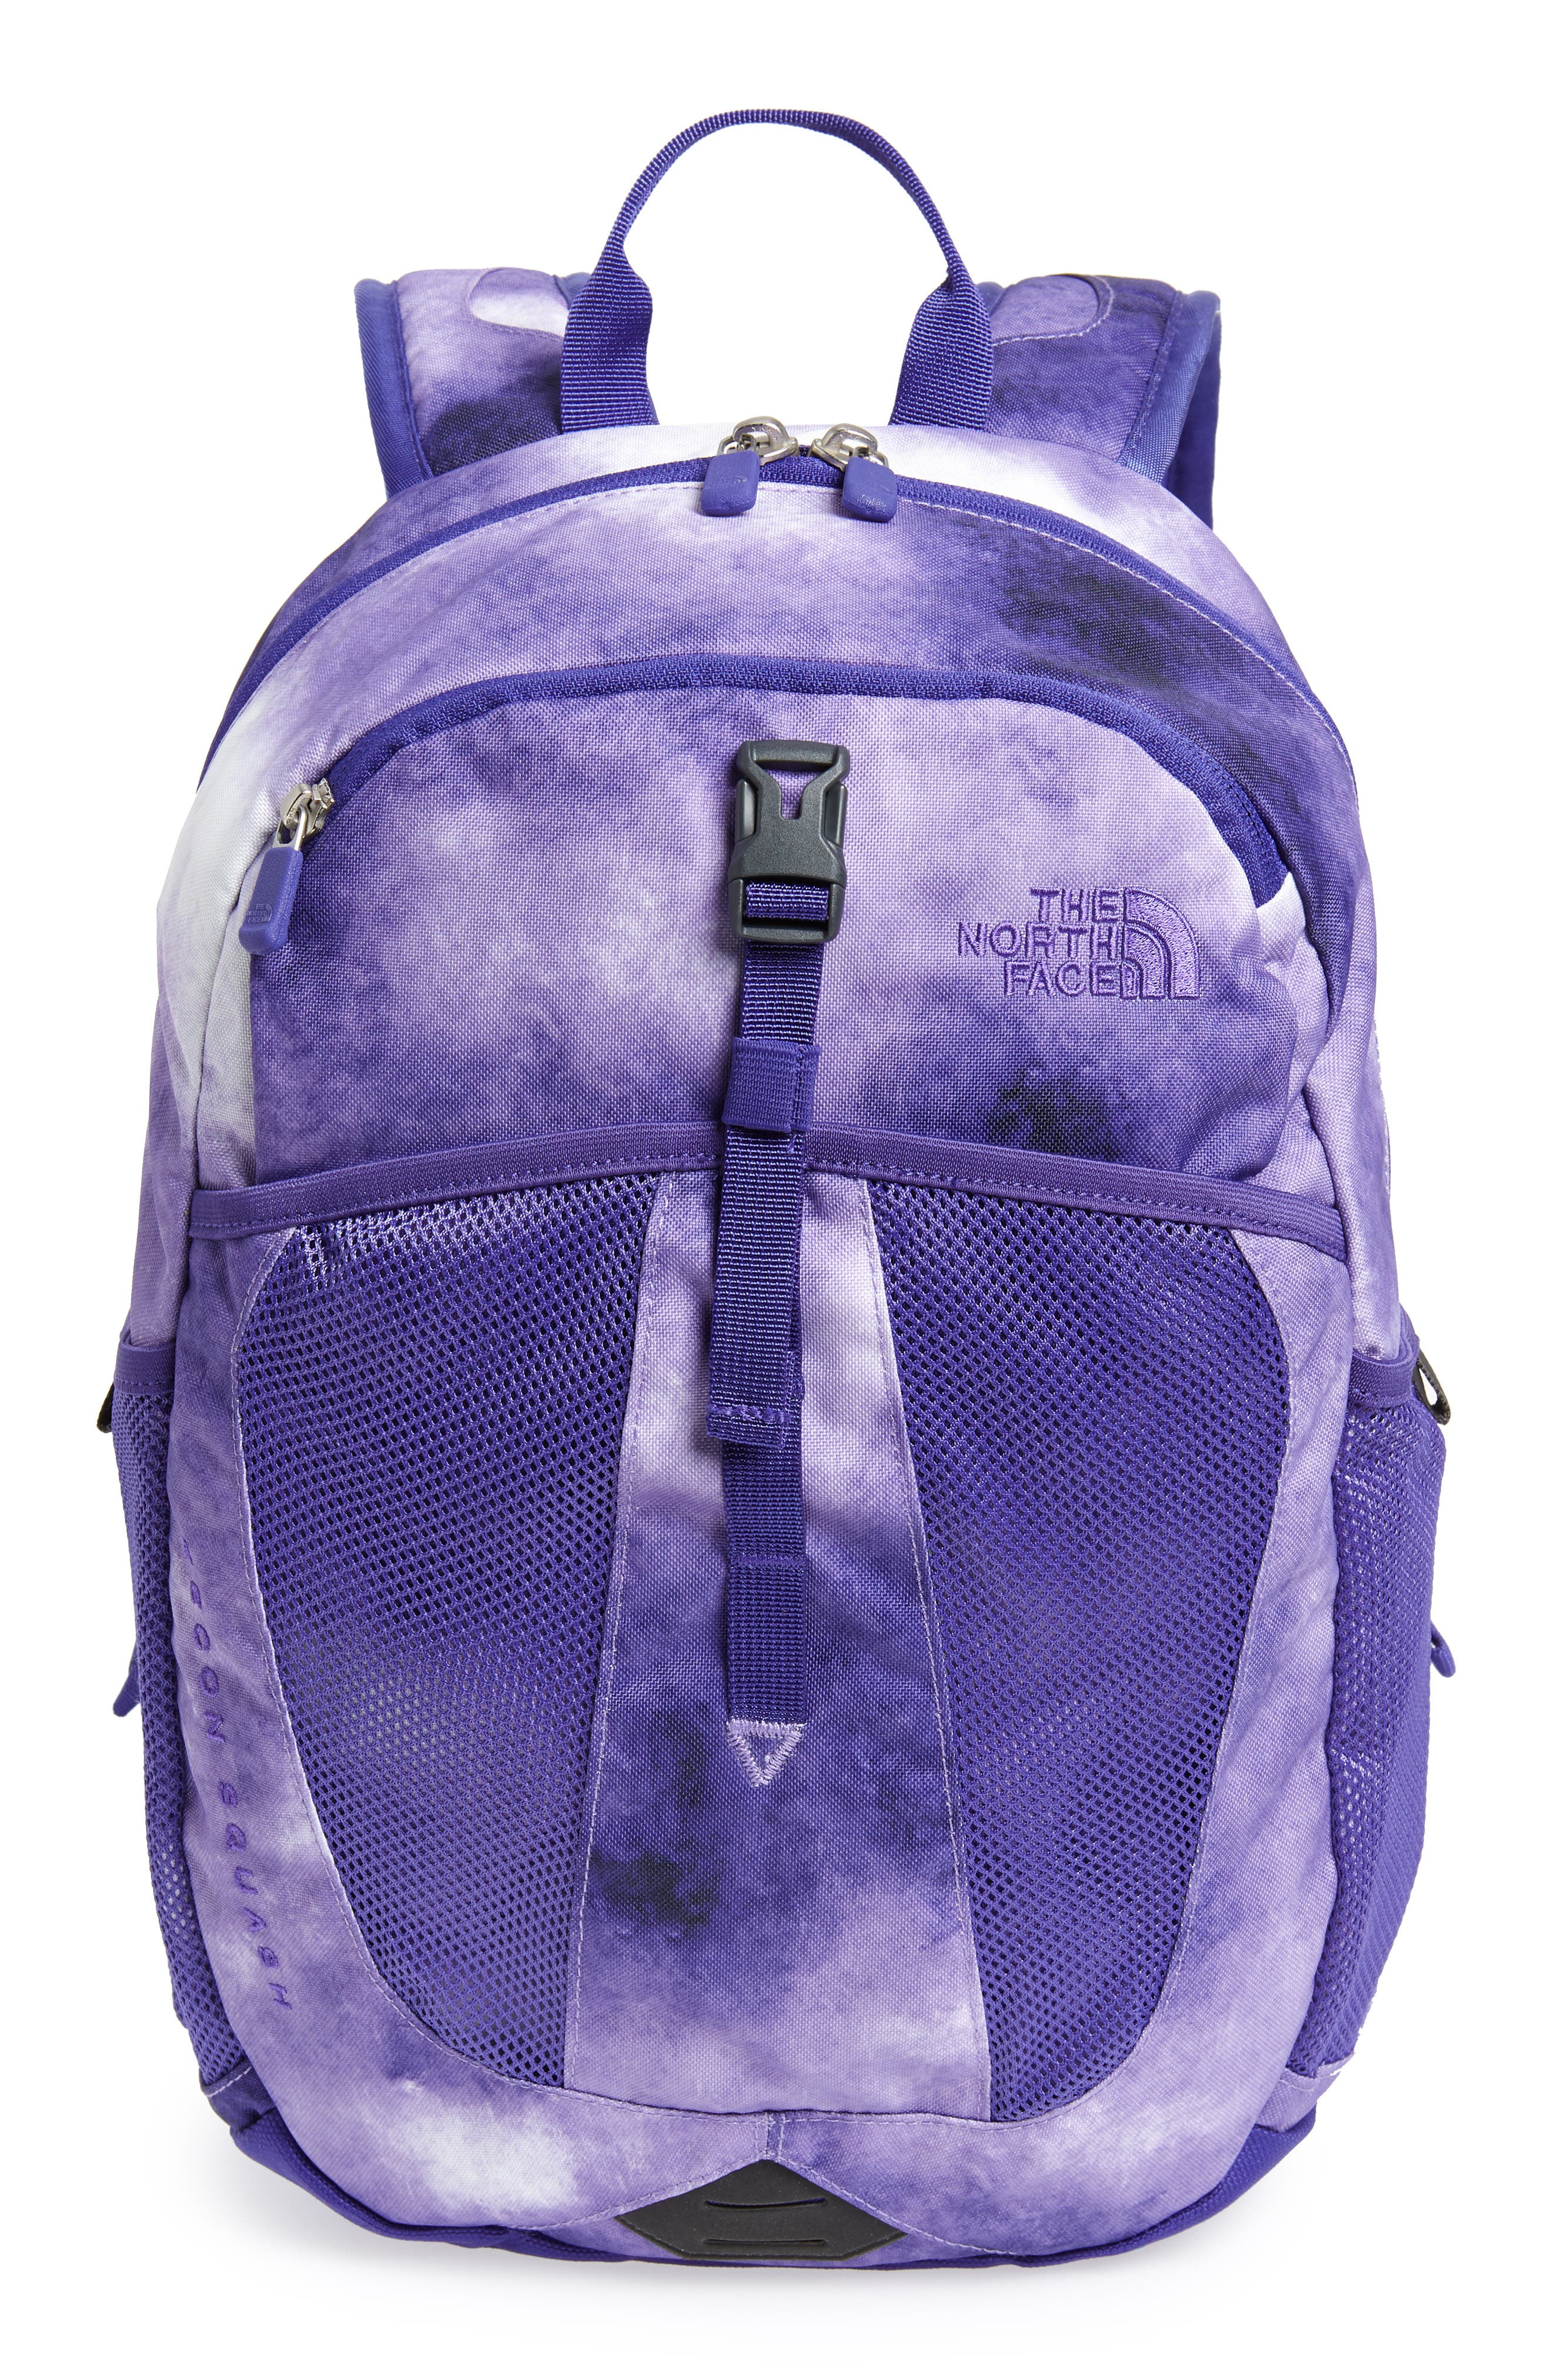 Recon Squash Backpack,                             Main thumbnail 1, color,                             501